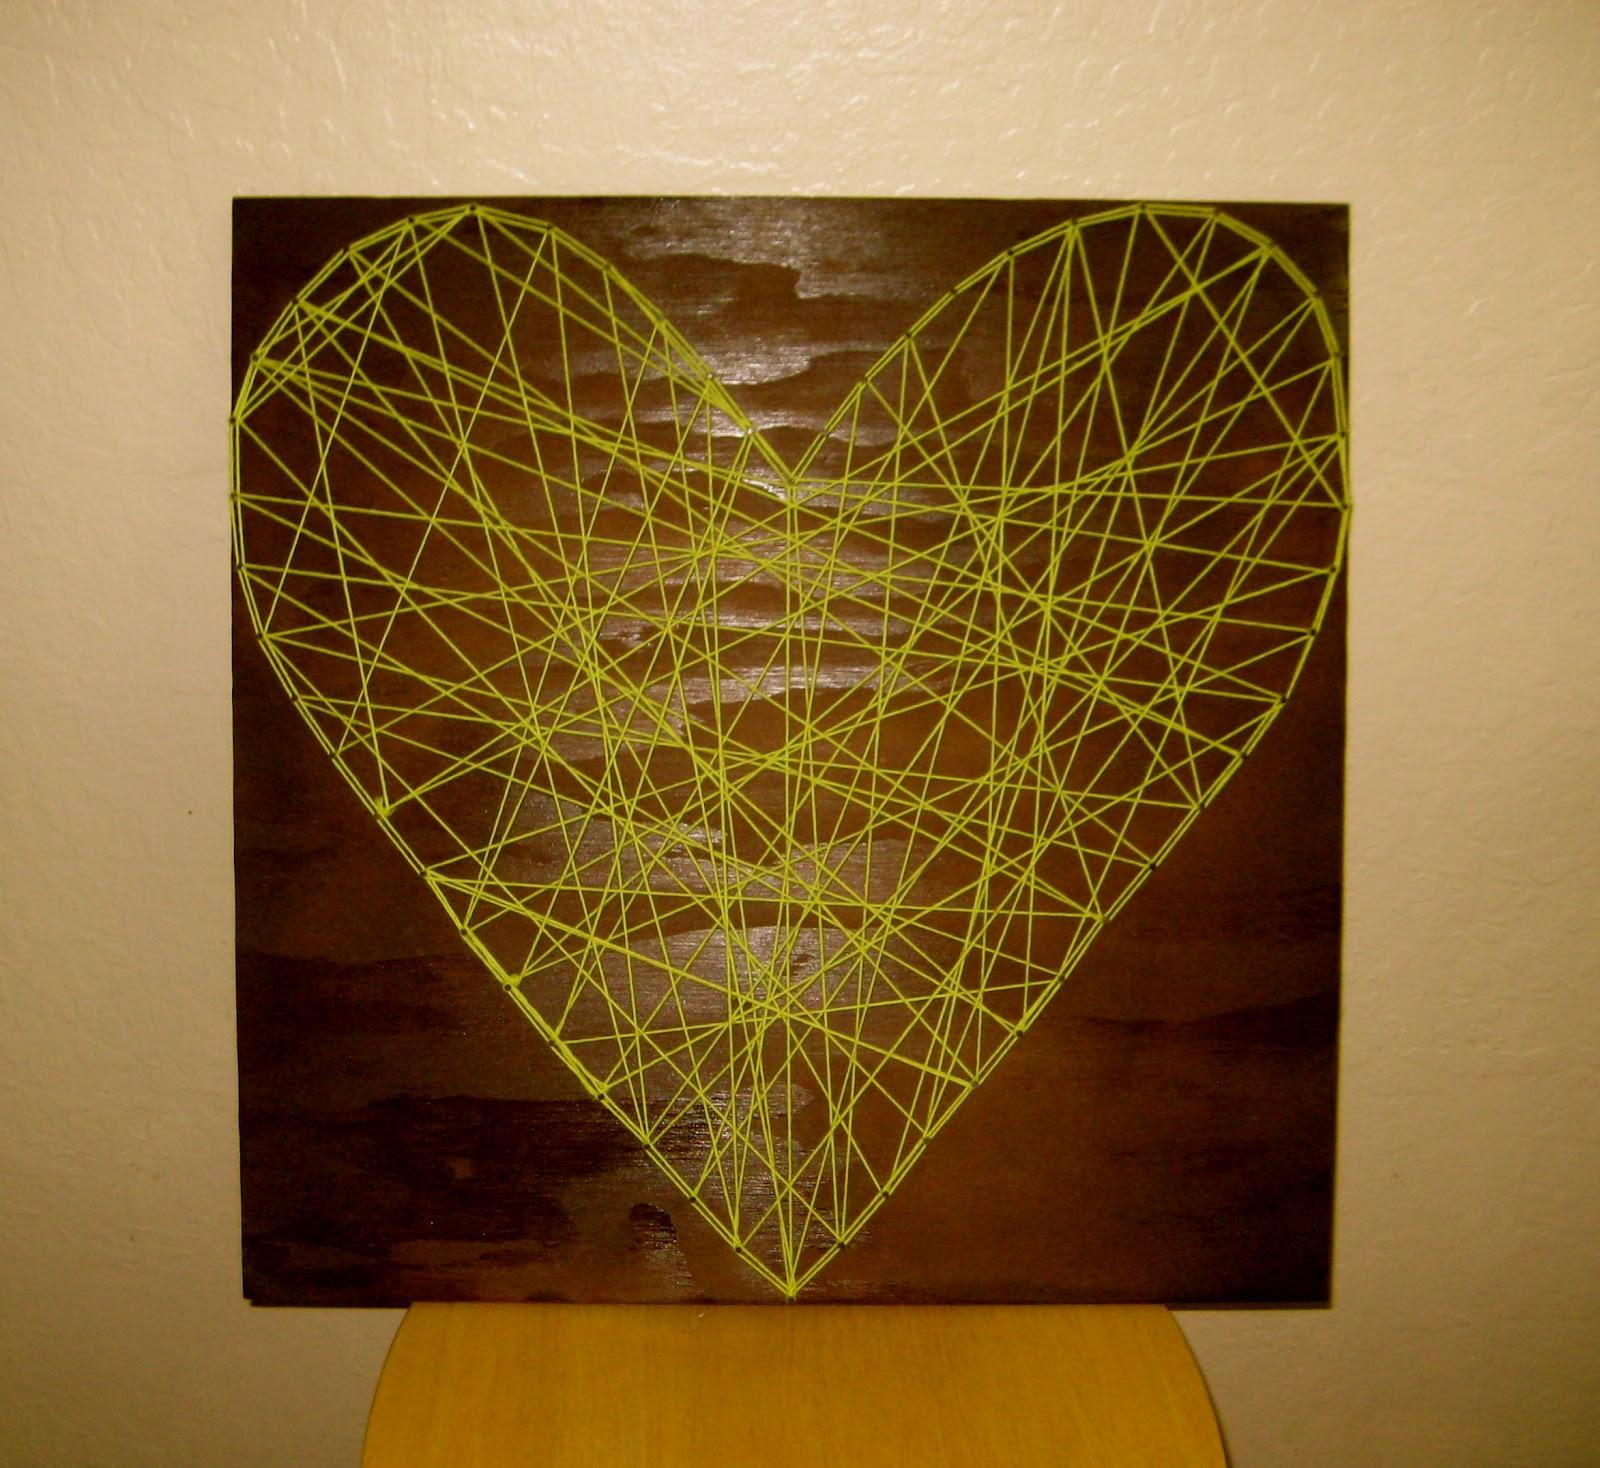 prettyLOVE, prettyLIFE: prettyLITTLE string-art